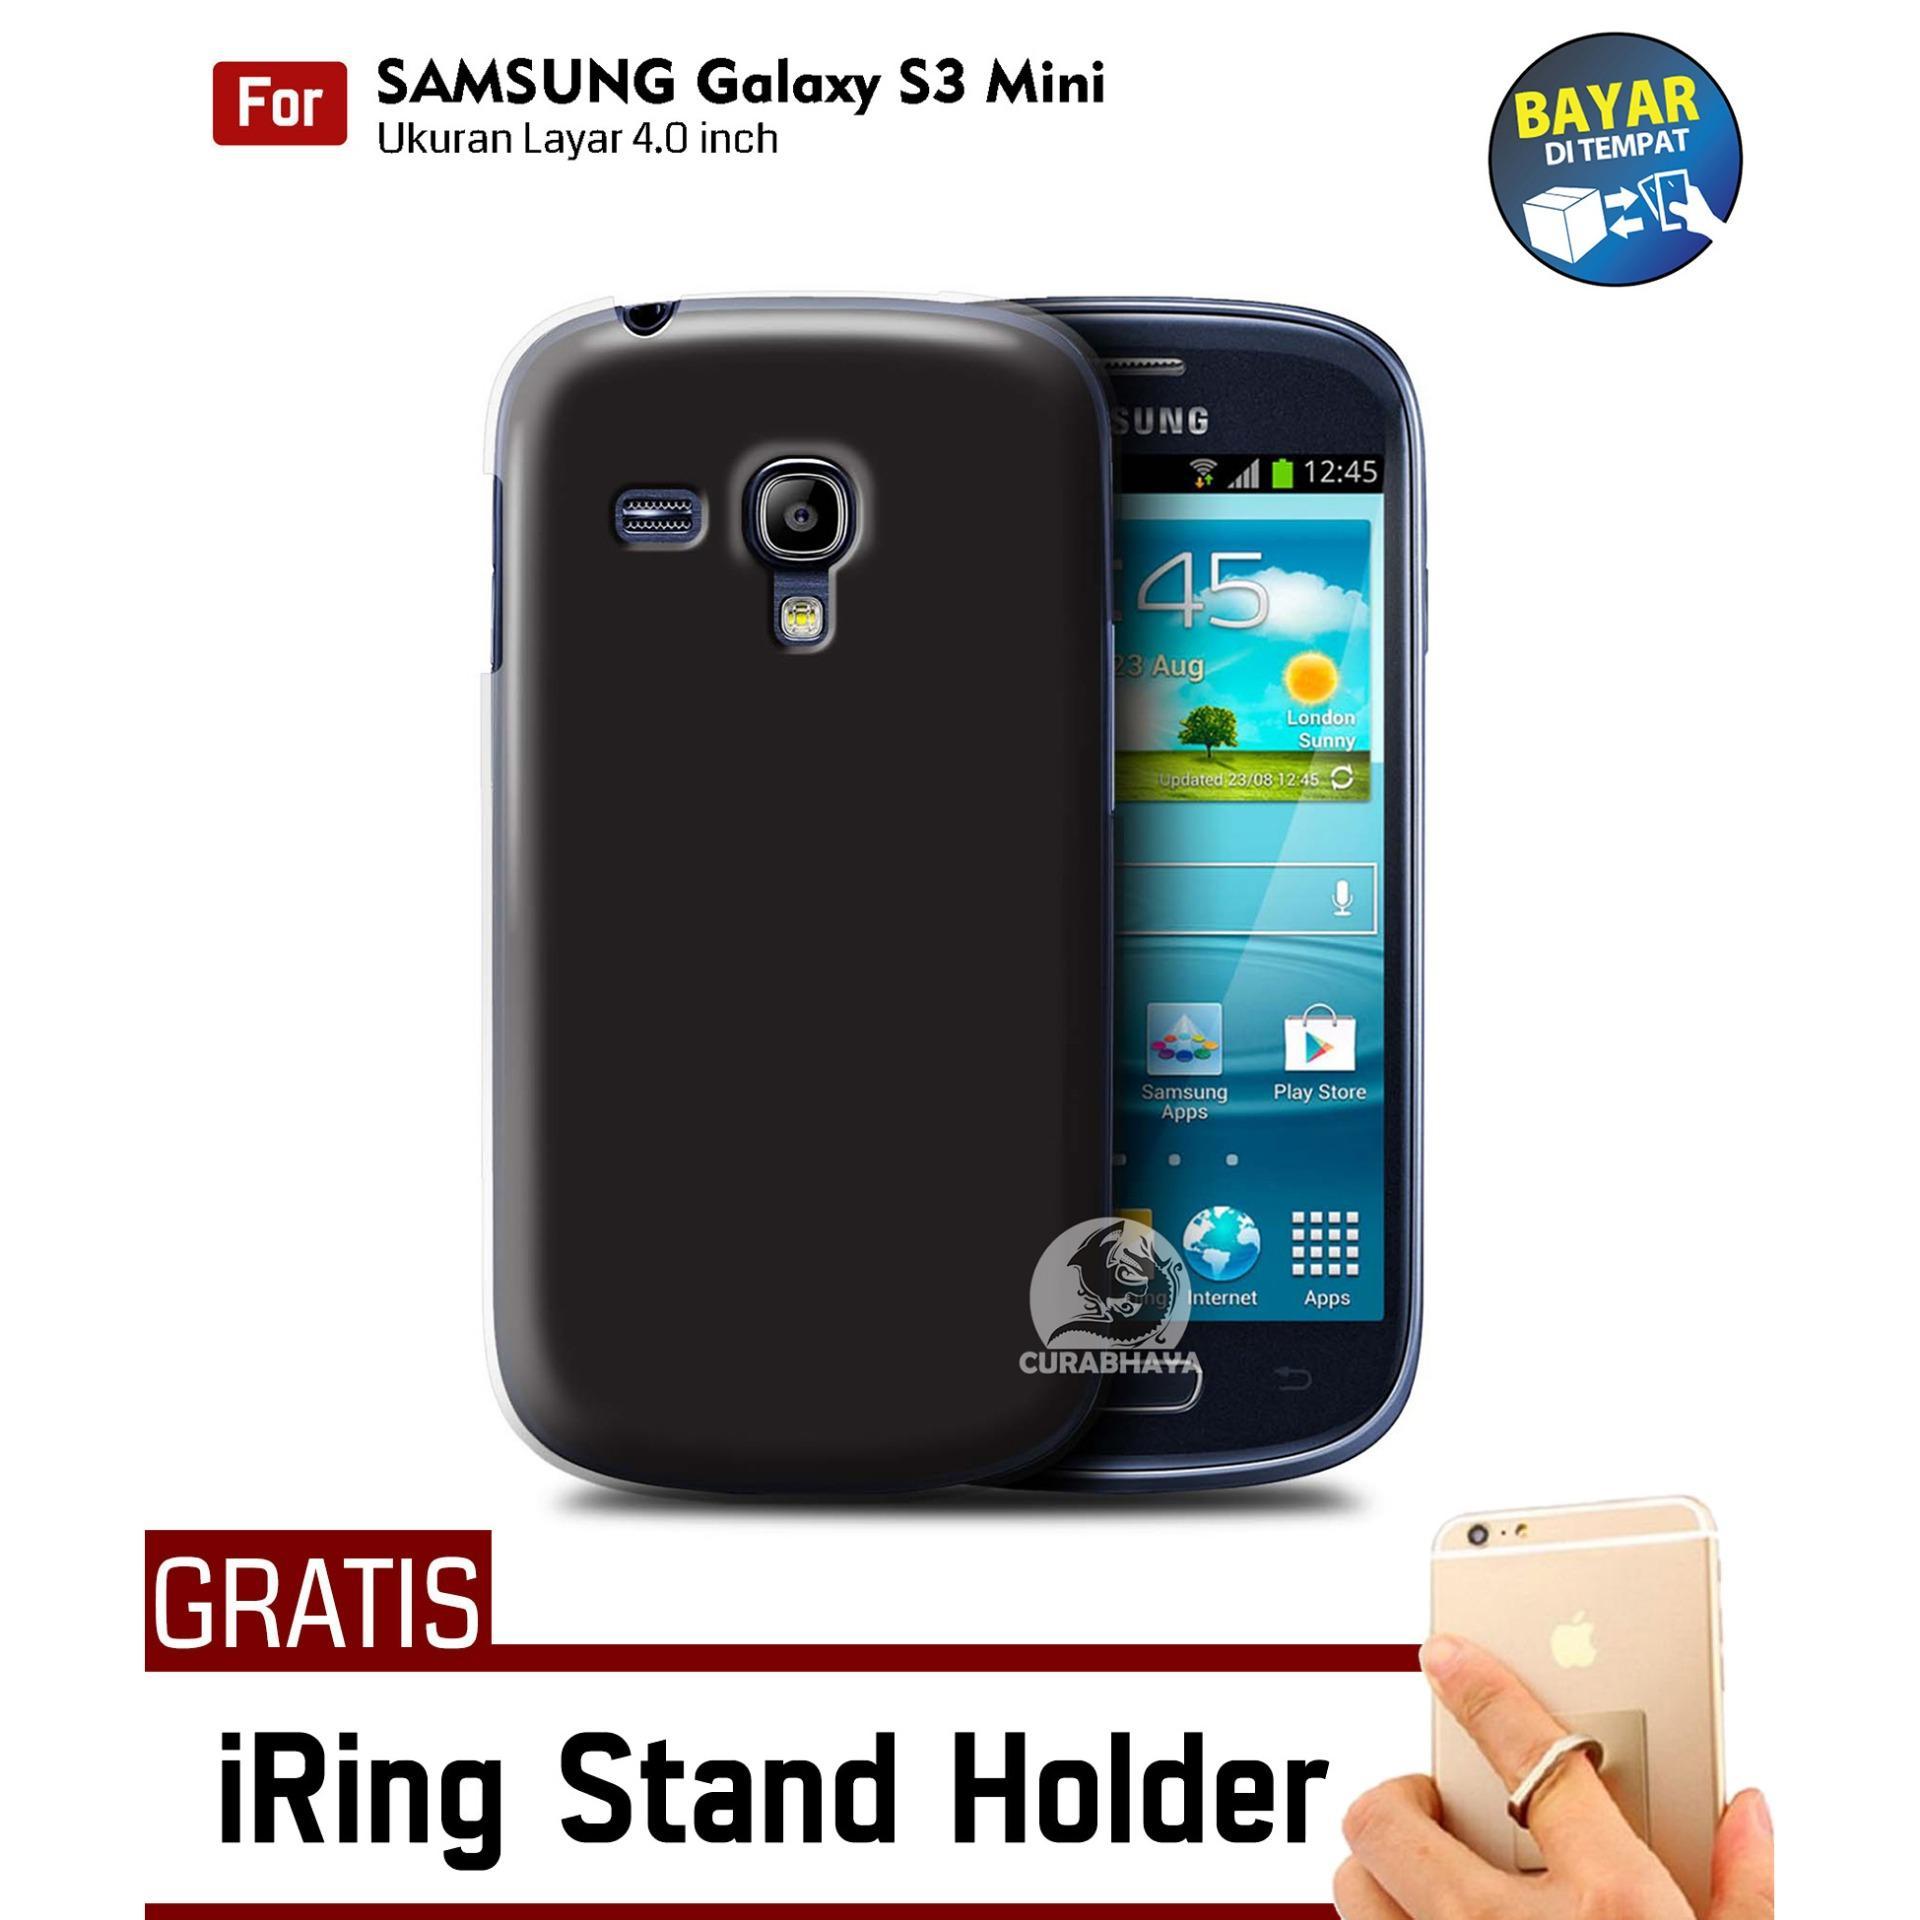 MidNight Samsung Galaxy S3 Mini / I8190 / I8200 / Duos   Slim Case Black Matte Softcase Premium Baby Skin + Gratis Free iRing Stand